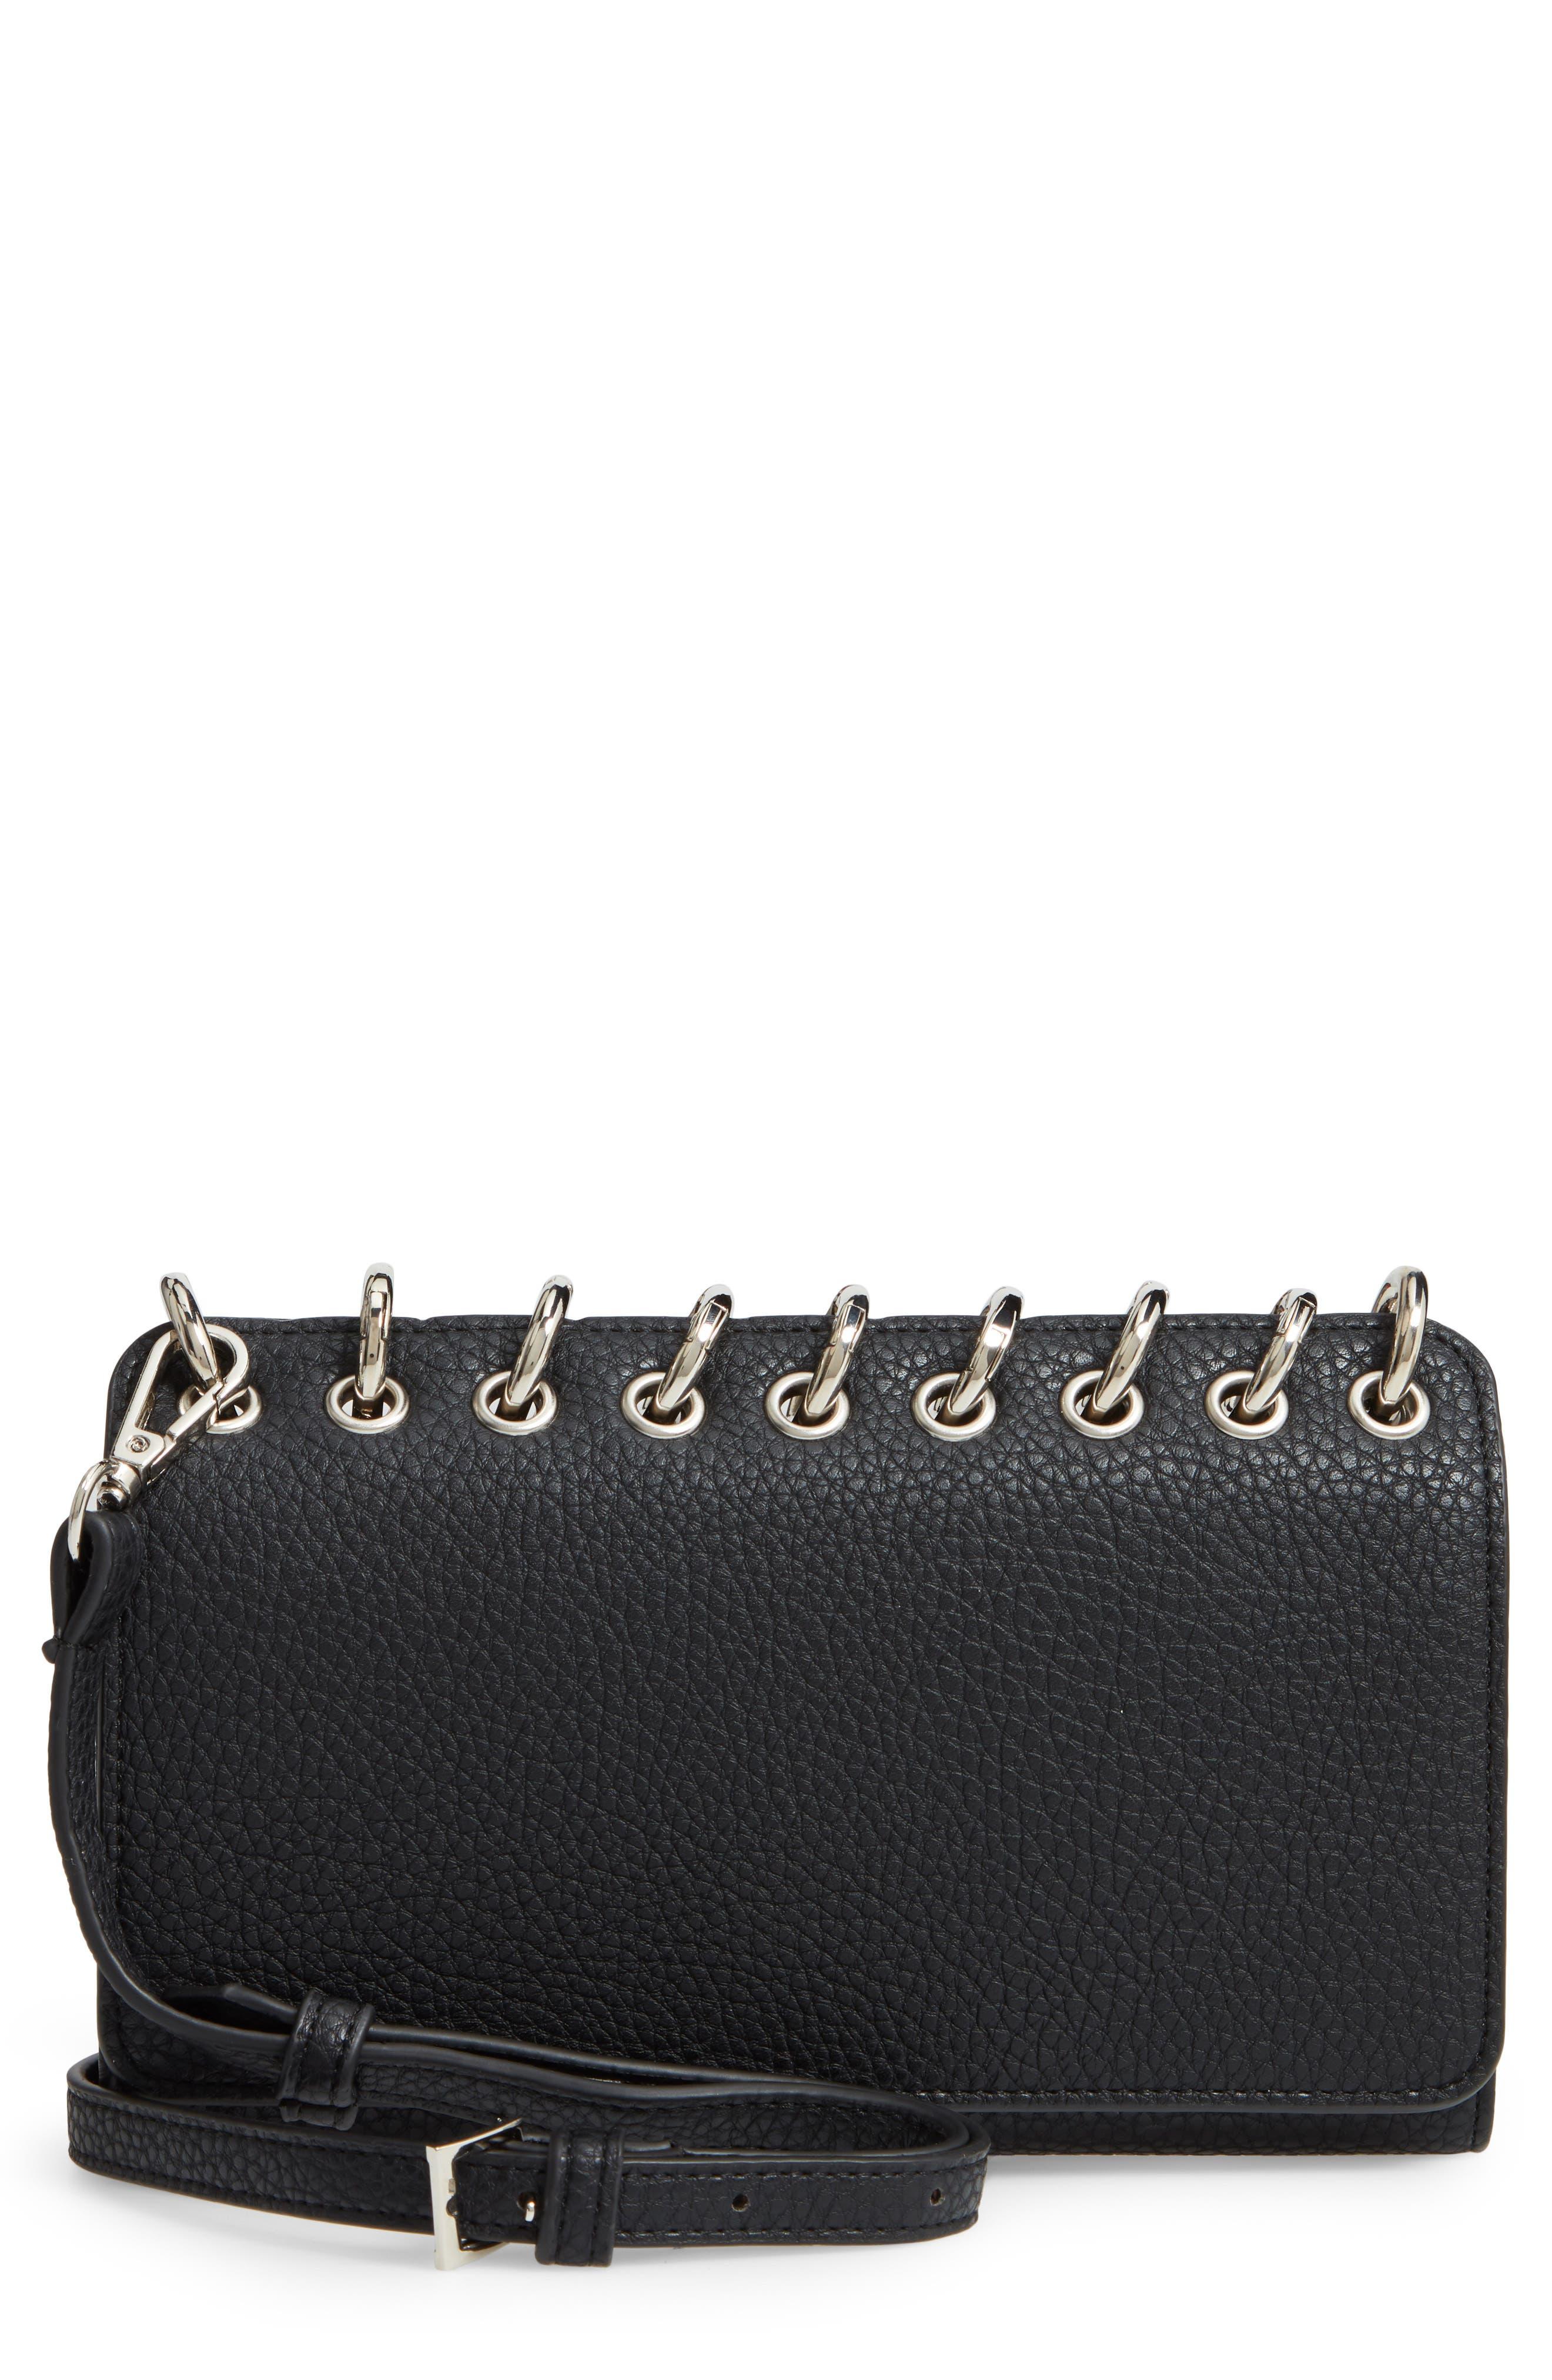 SONDRA ROBERTS Ring Faux Leather Crossbody Bag - Black